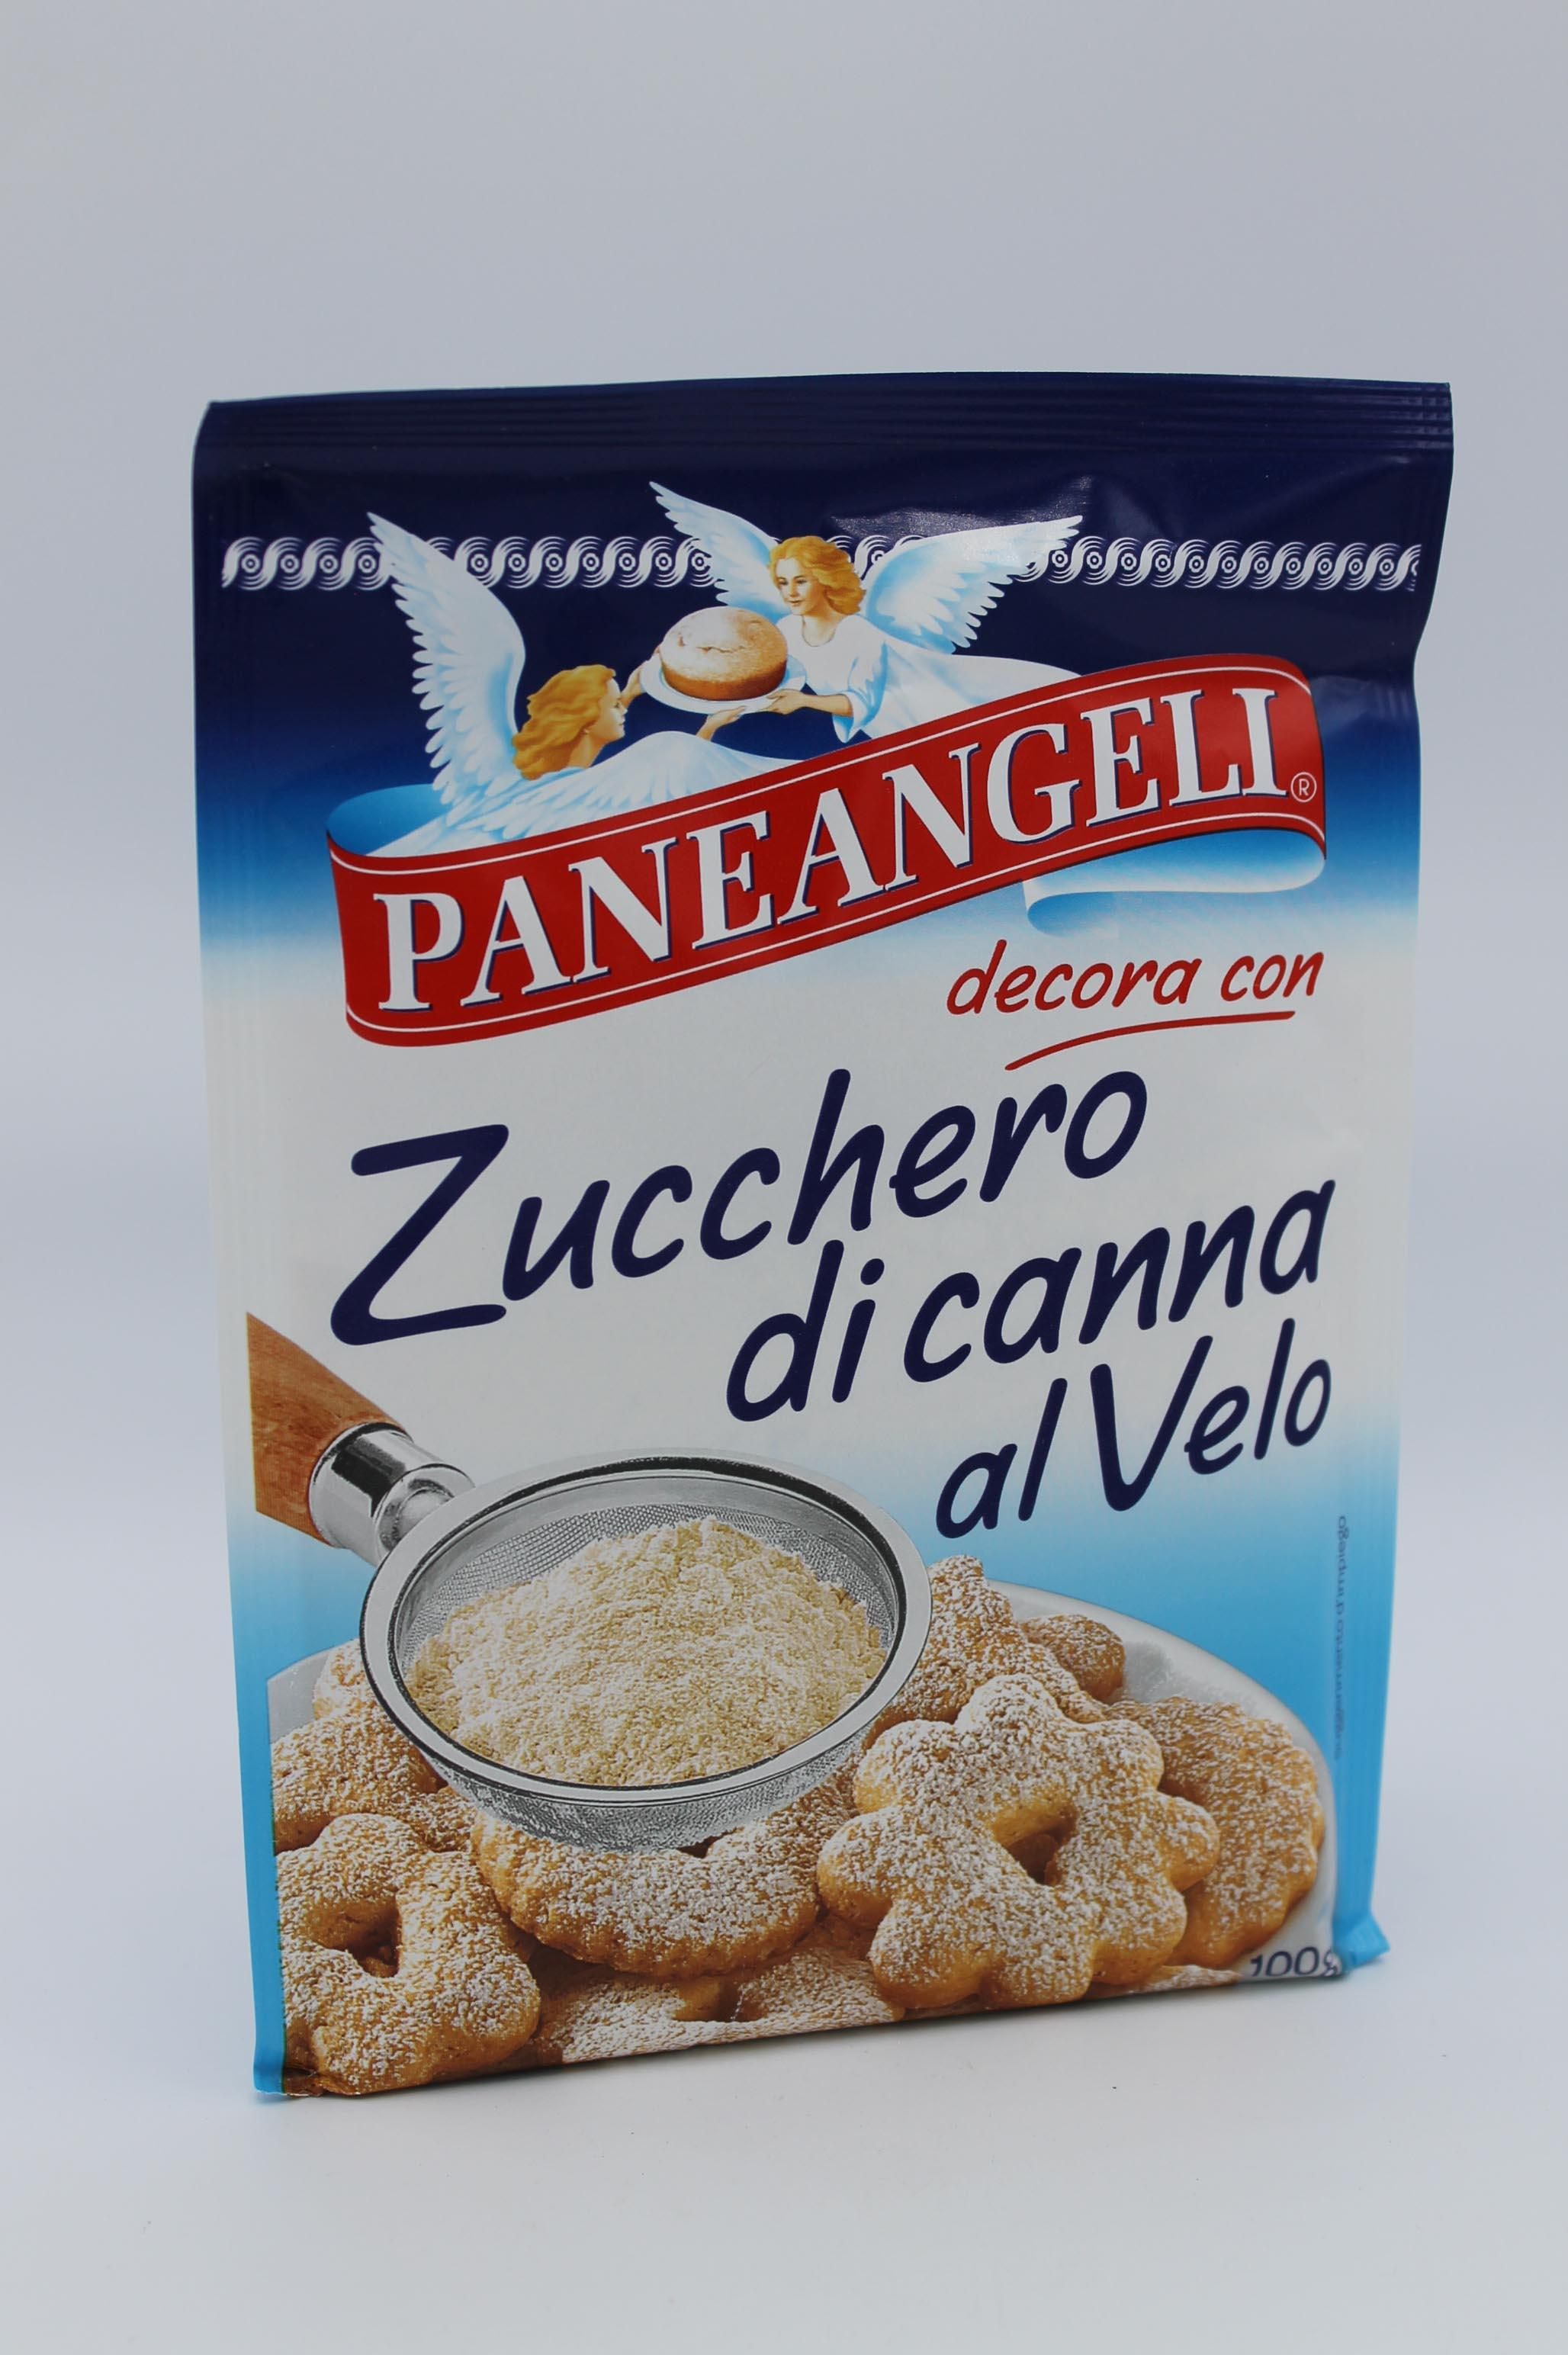 Paneangeli zucchero canna al velo 100 gr.